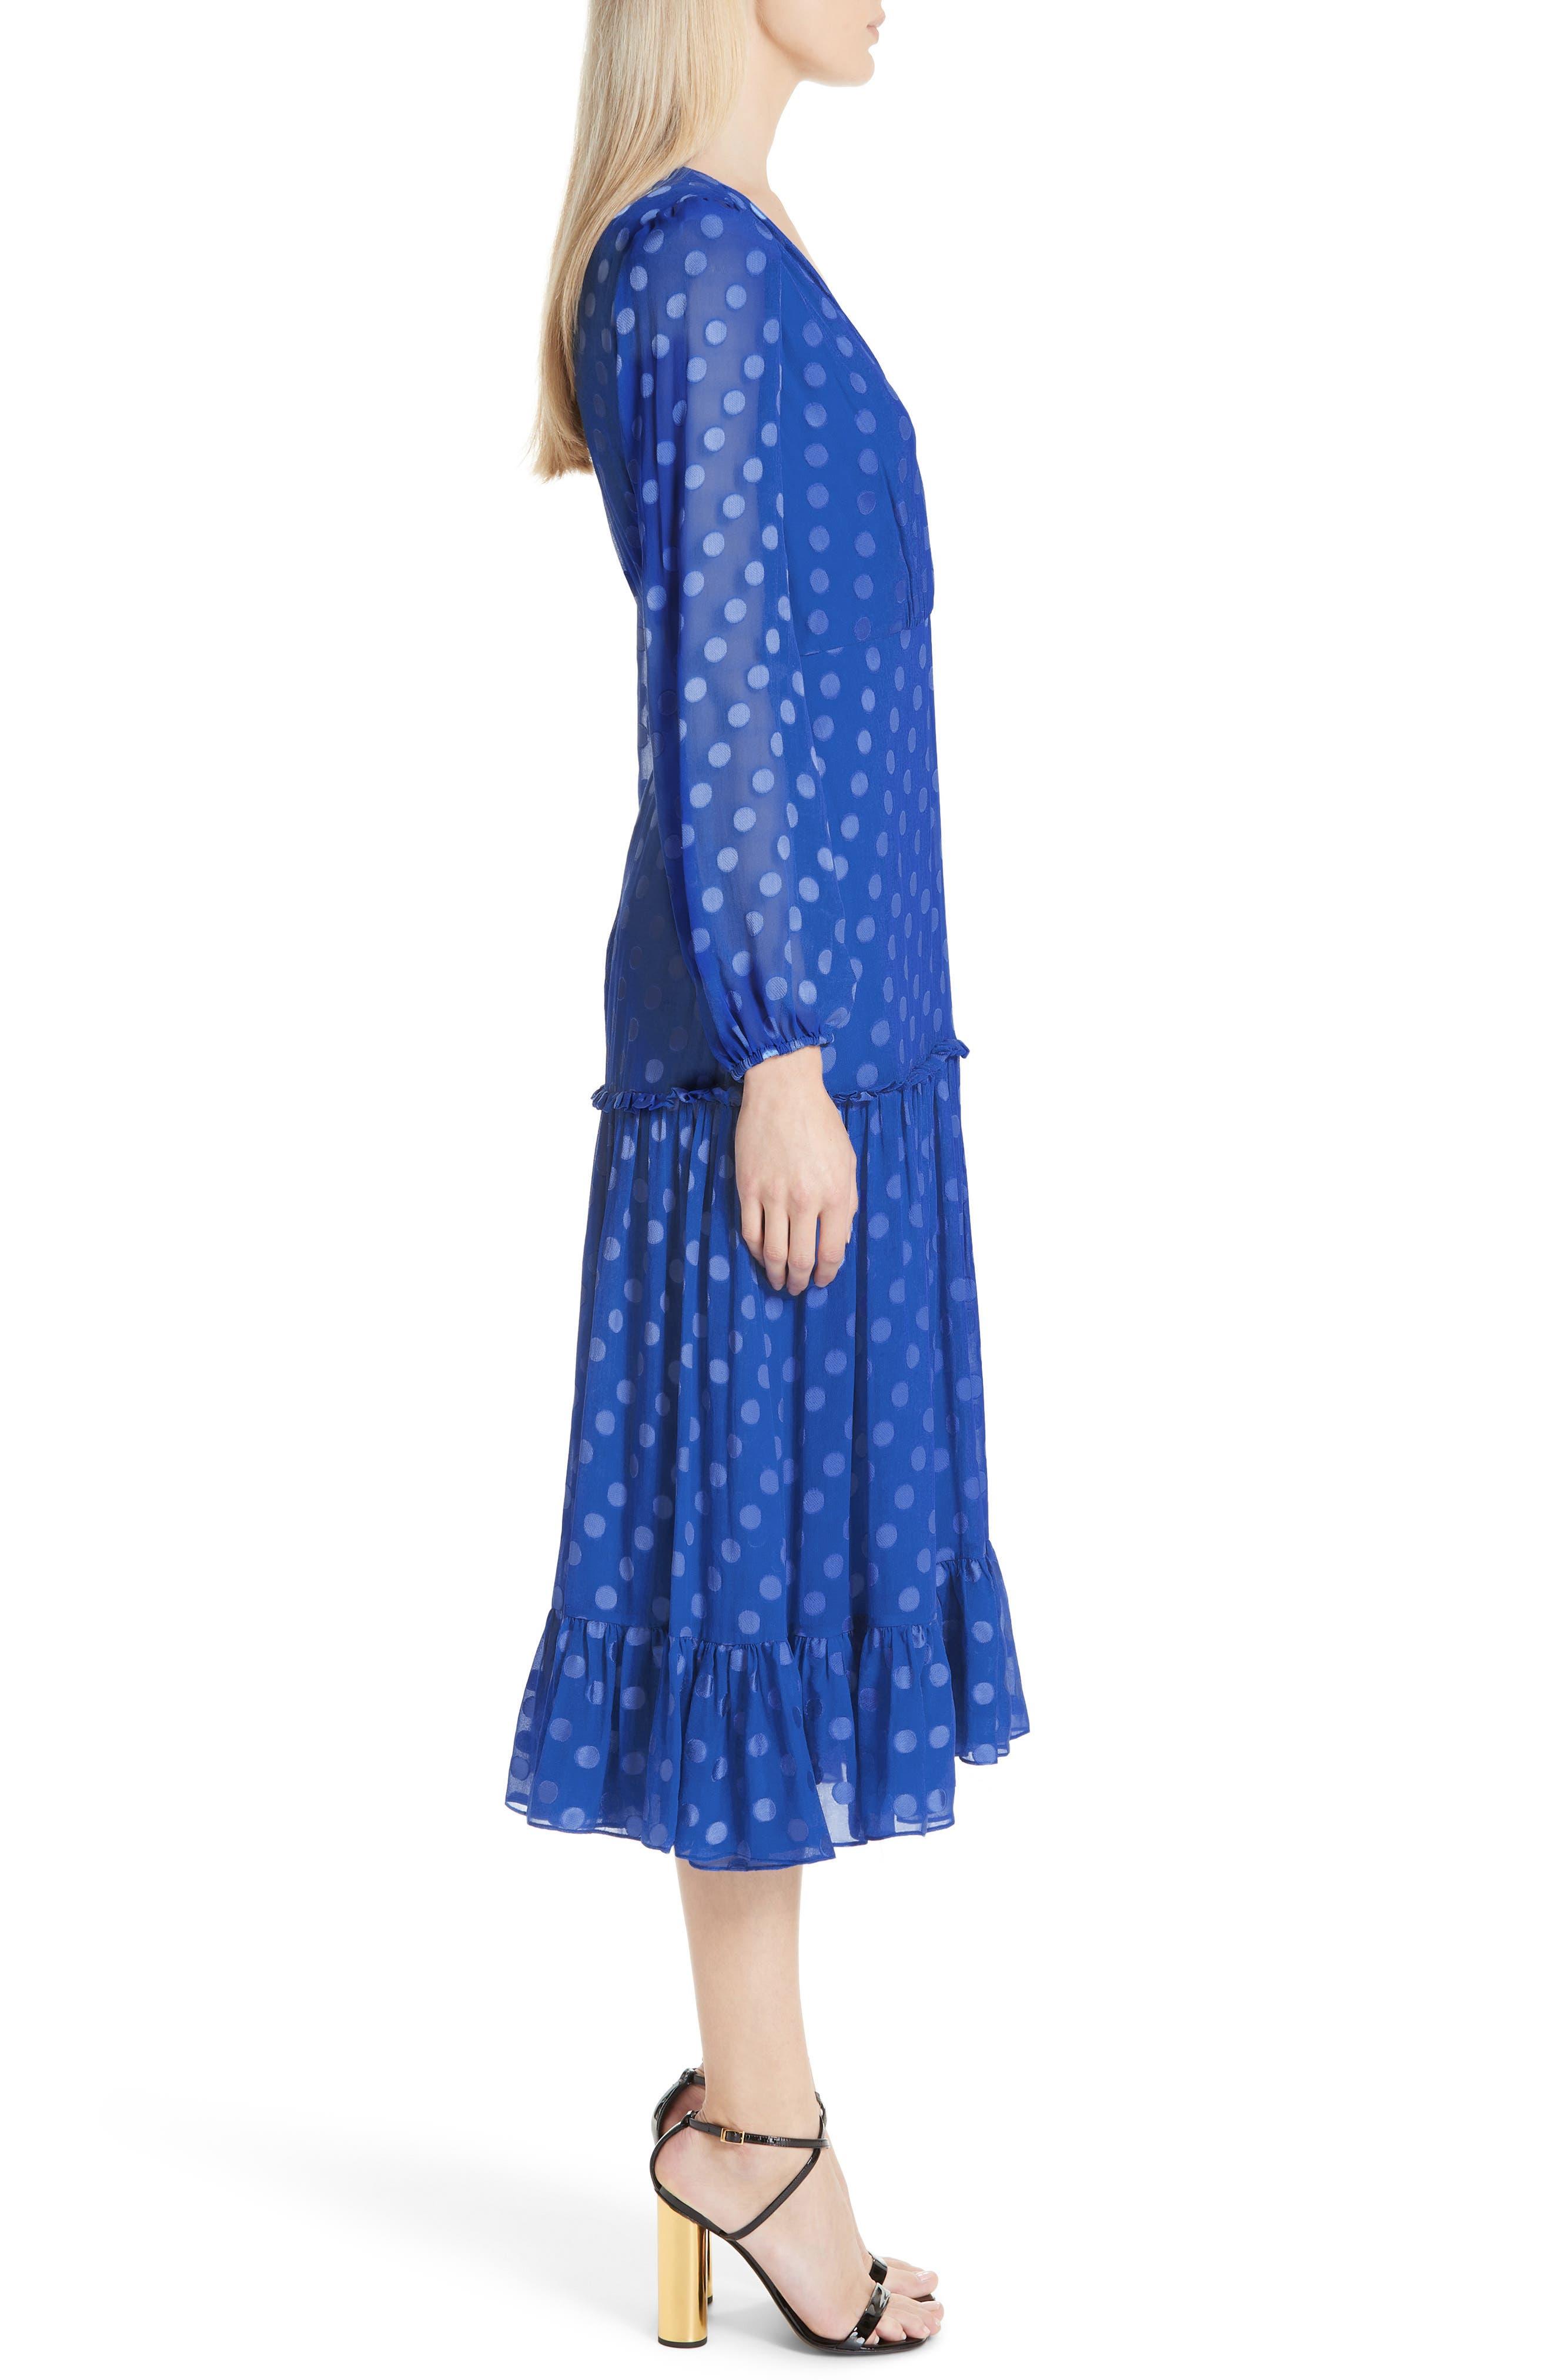 SALONI, Polka Dot Ruffle Dress, Alternate thumbnail 3, color, COBALT BLUE